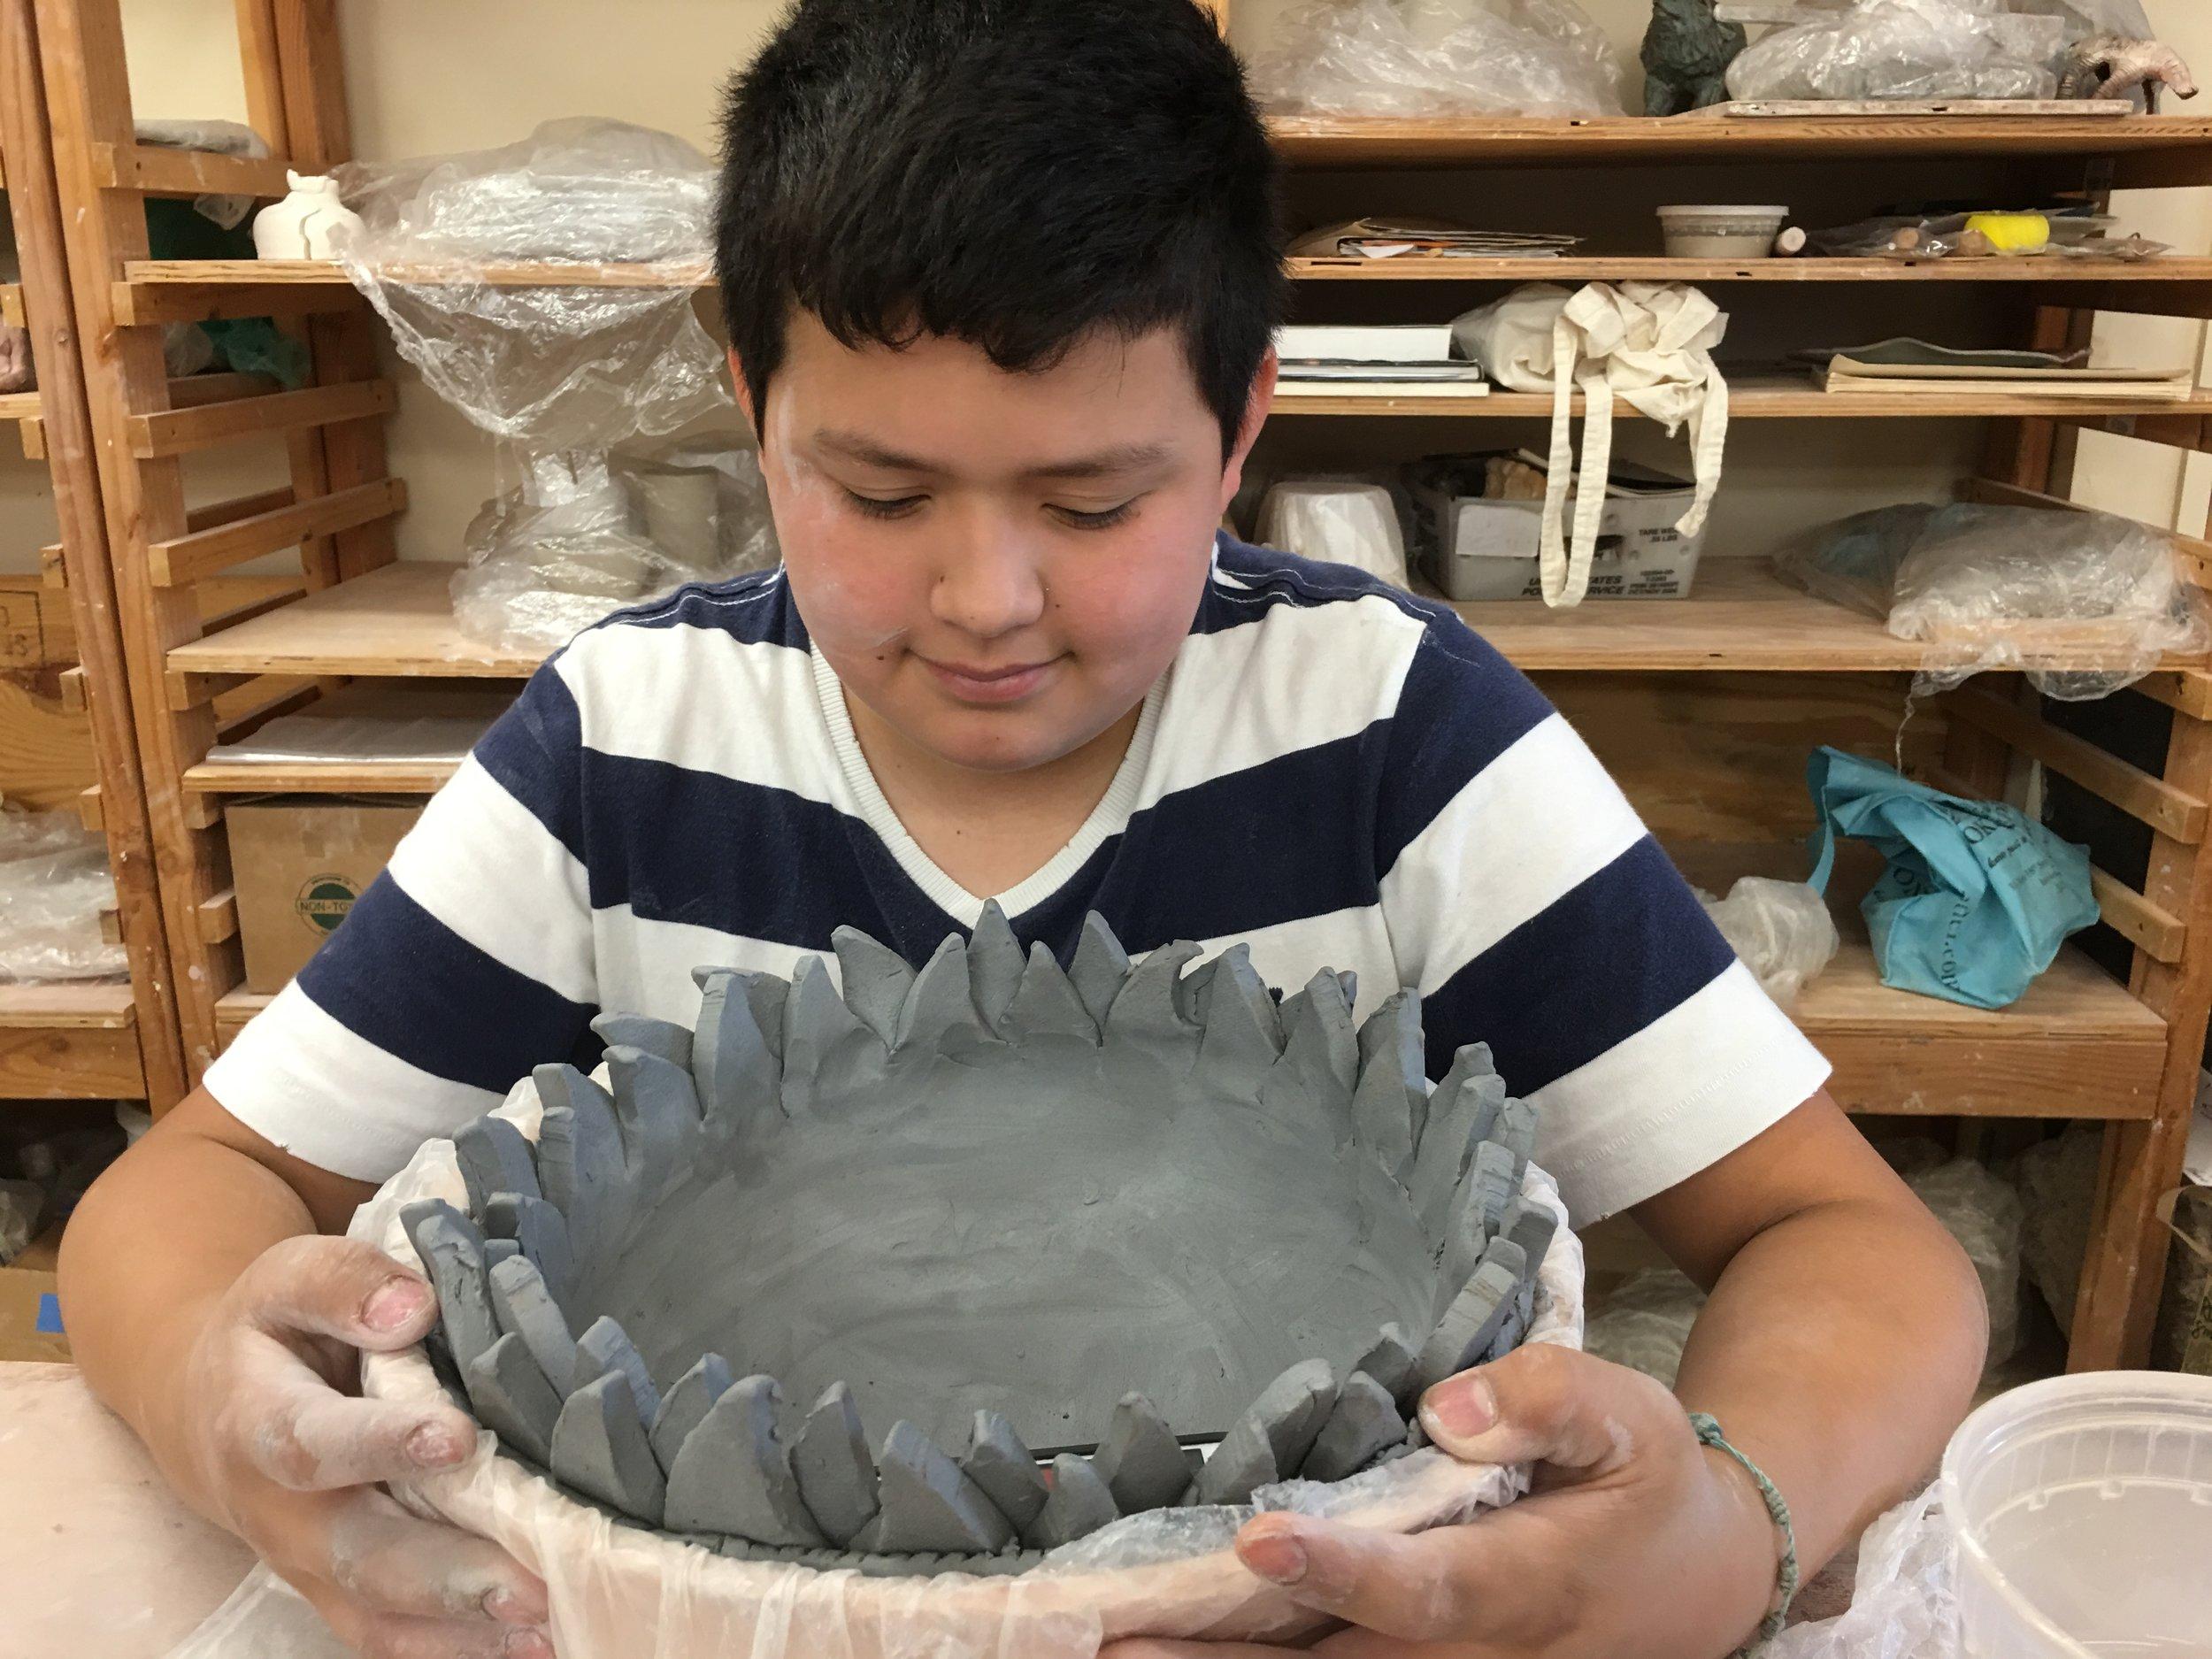 clay-art-center-kids-bring-change_28026439230_o.jpg